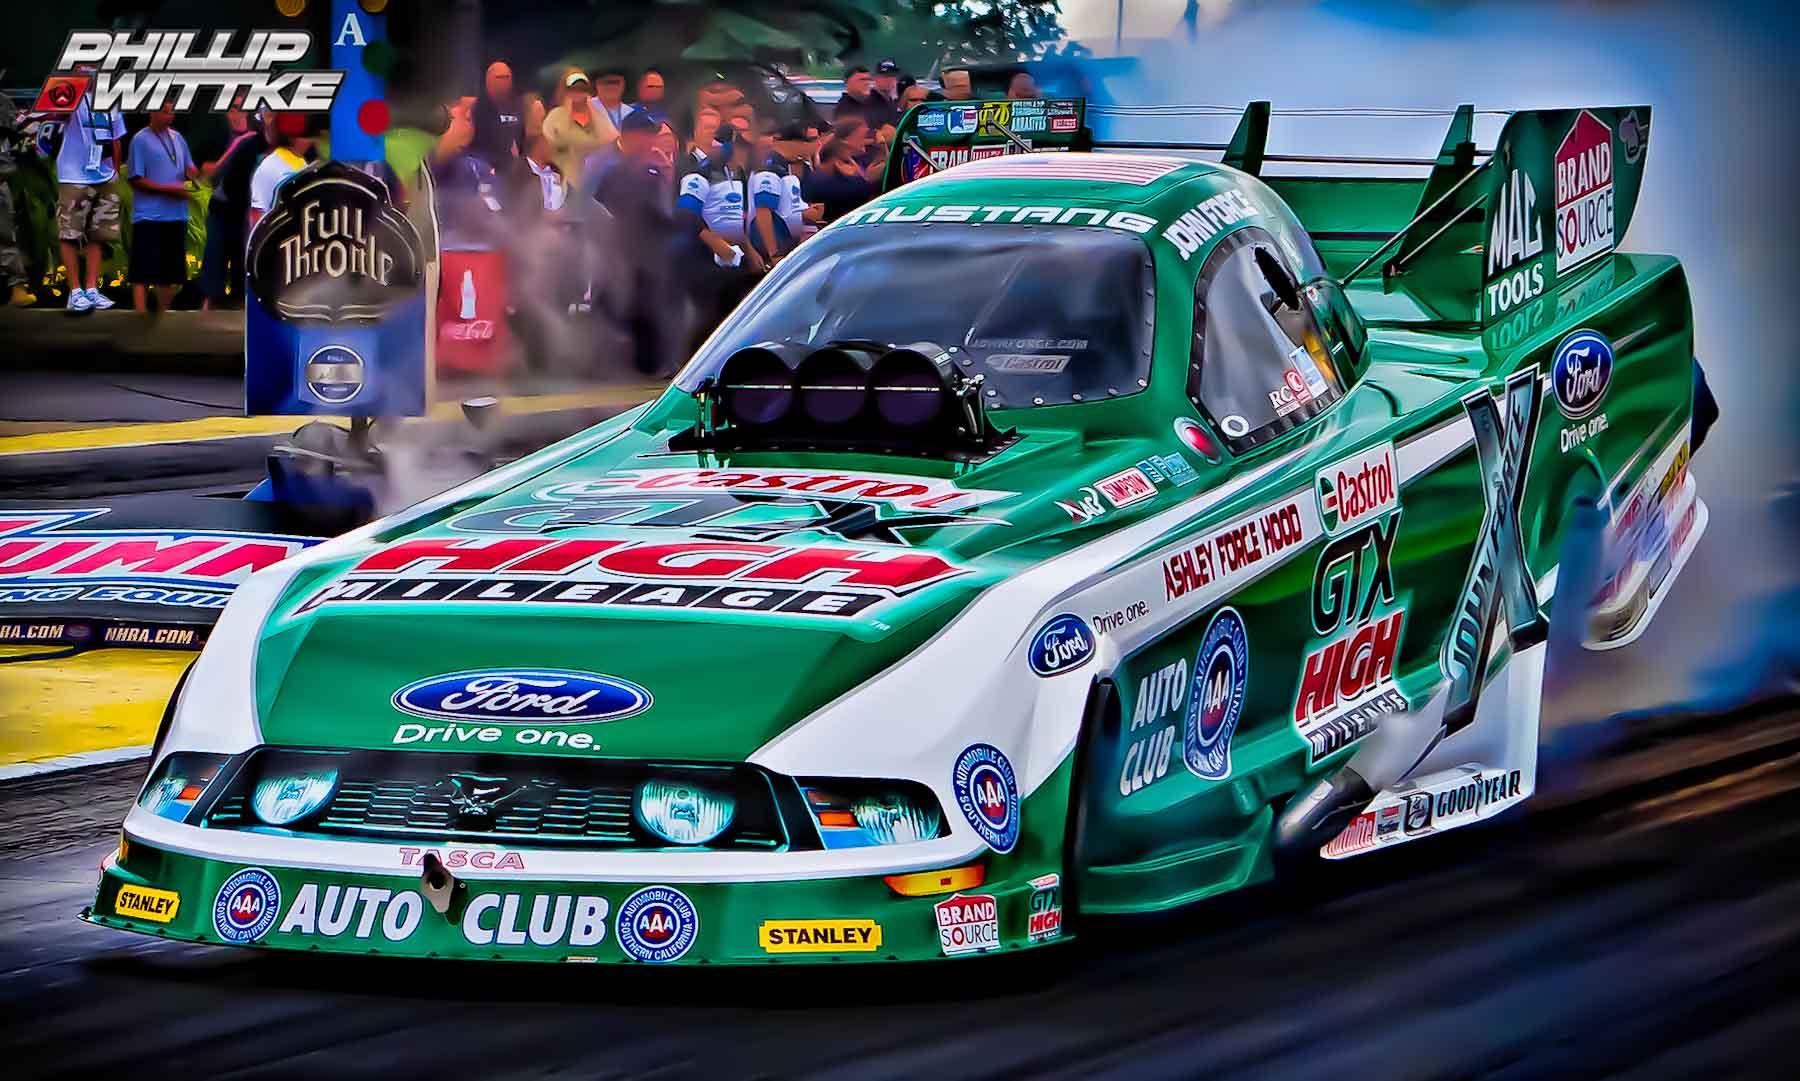 Nhra Funny Cars Race Racing Drag Gw Wallpaper 1800x1081